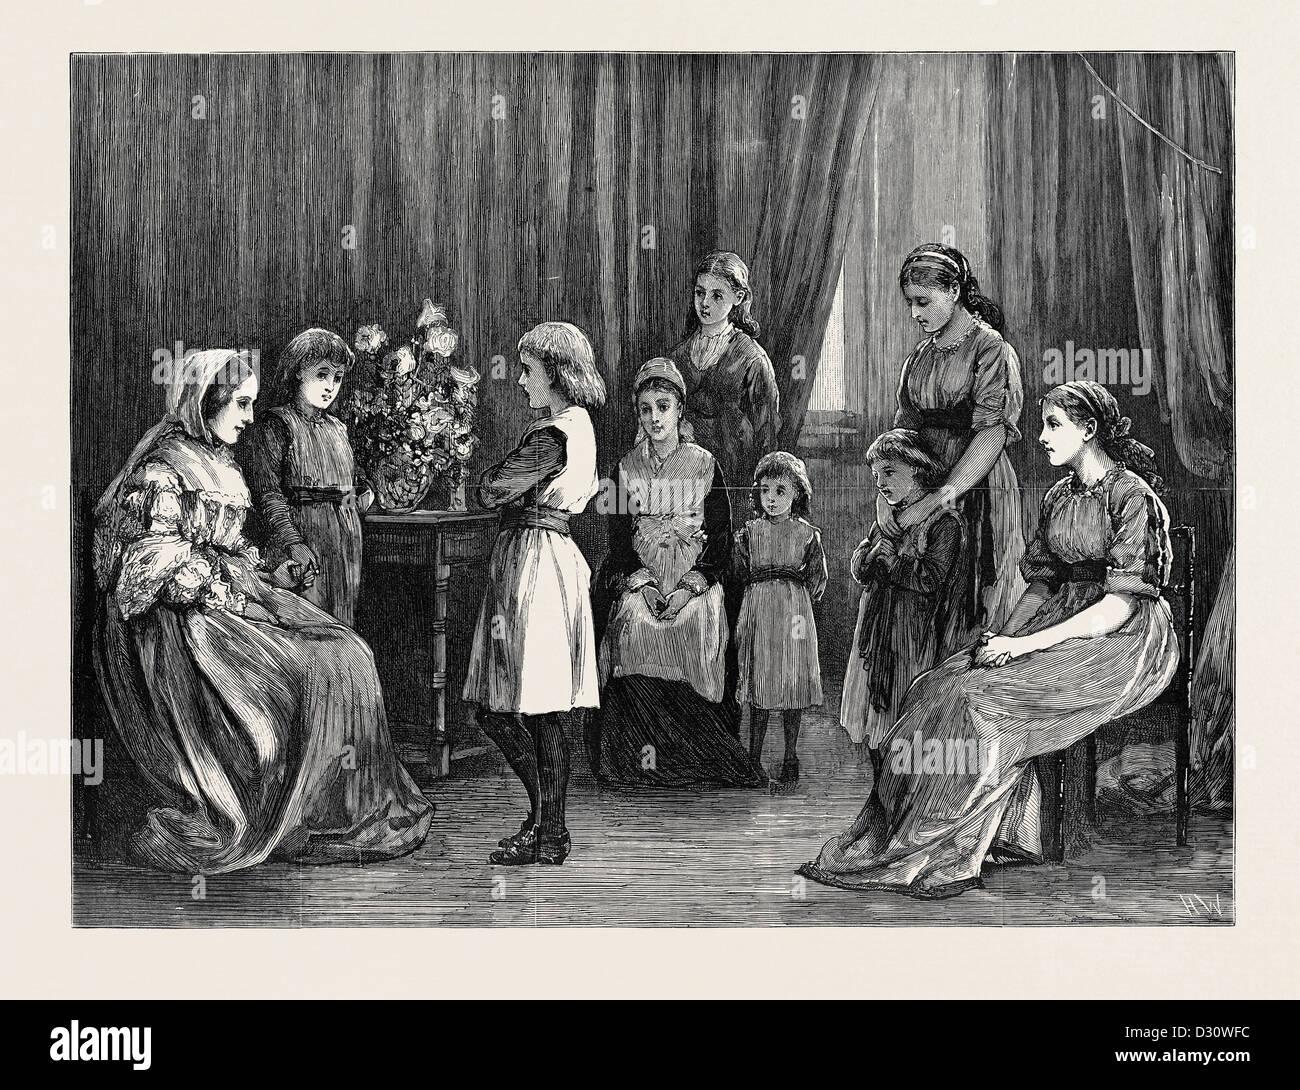 BUNYAN'S 'PILGRIM'S PROGRESS' AT GROSVENOR HOUSE - Stock Image